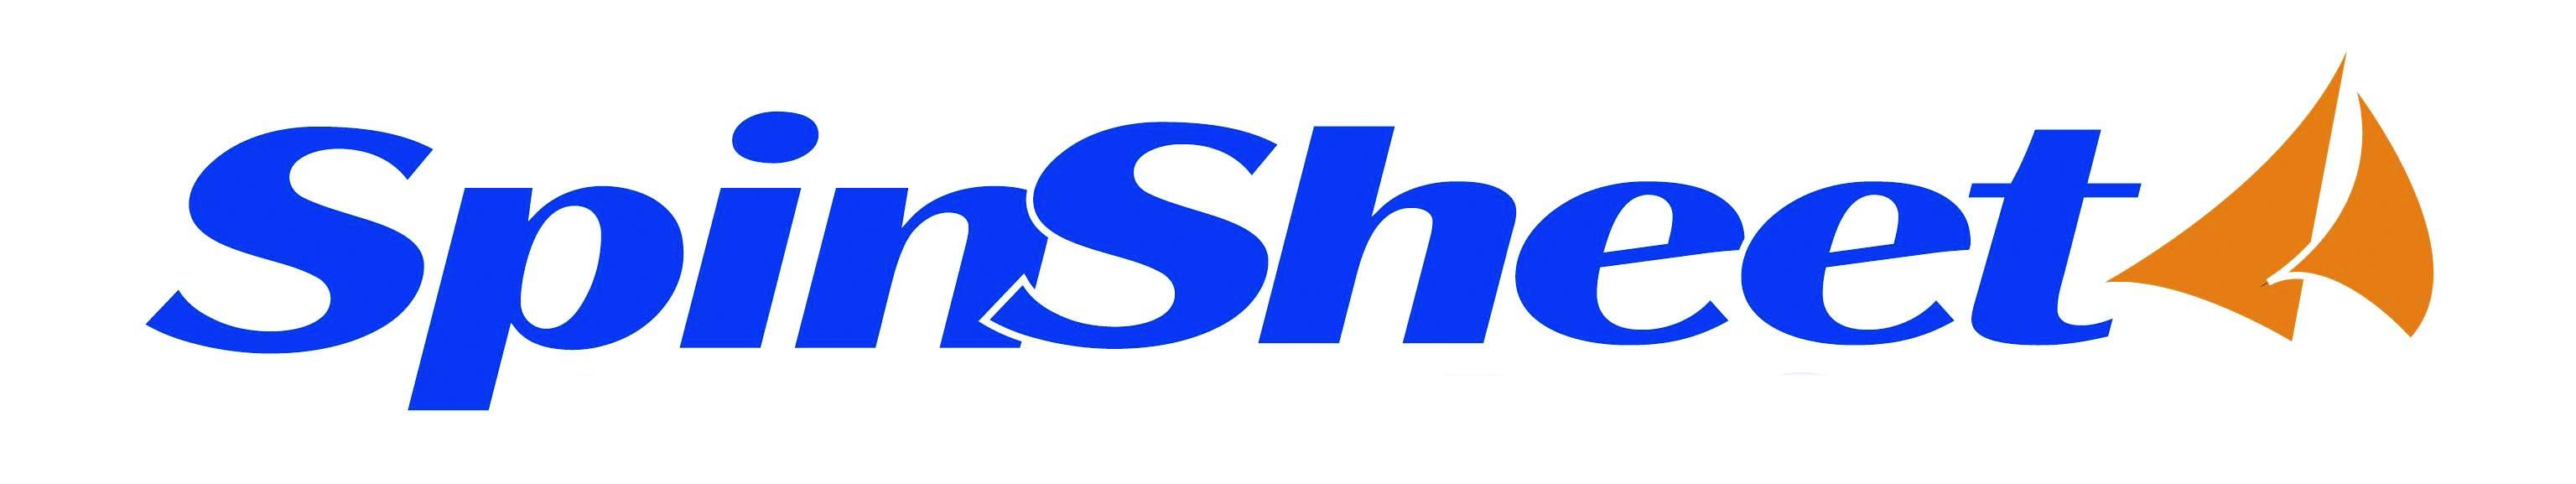 spinsheet_BlueOrangeHiRes.jpg